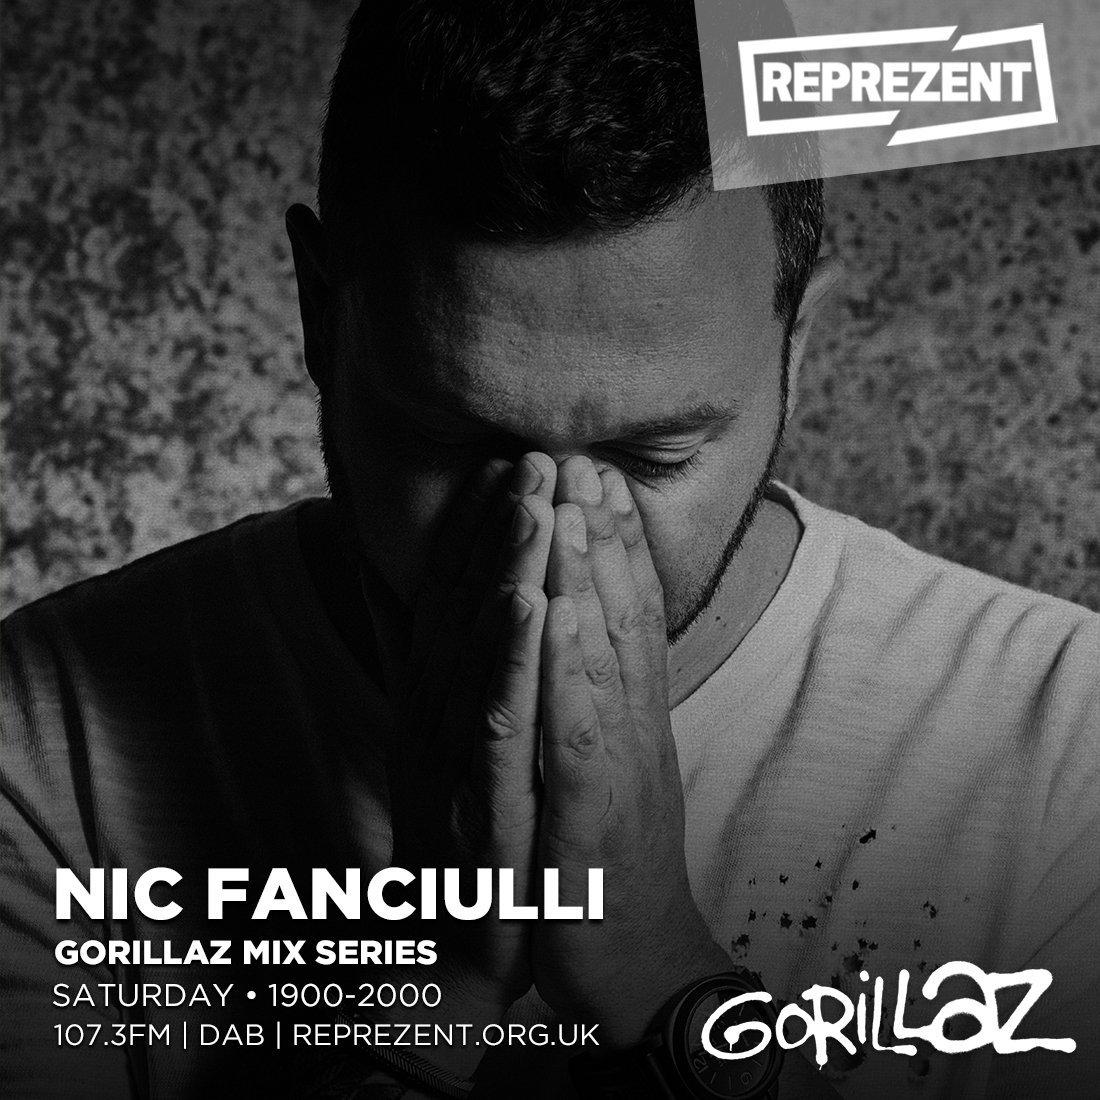 Gorillaz Mix Series: Nic Fanciulli